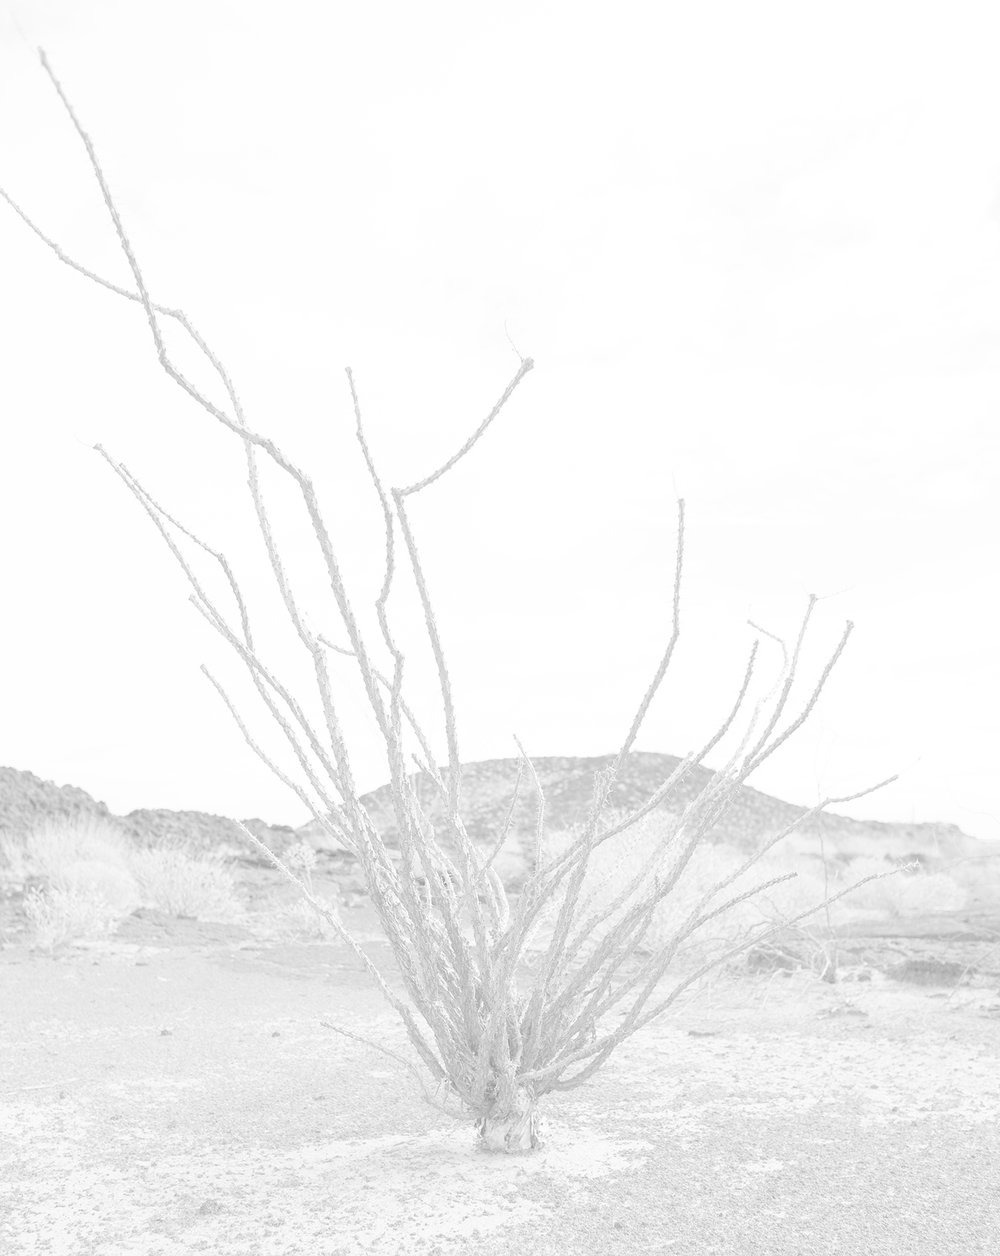 scott b. davis  ocotillo, ocotillo (no. 11), 2015/2016 palladium print 20 x 16 inches edition 1/5